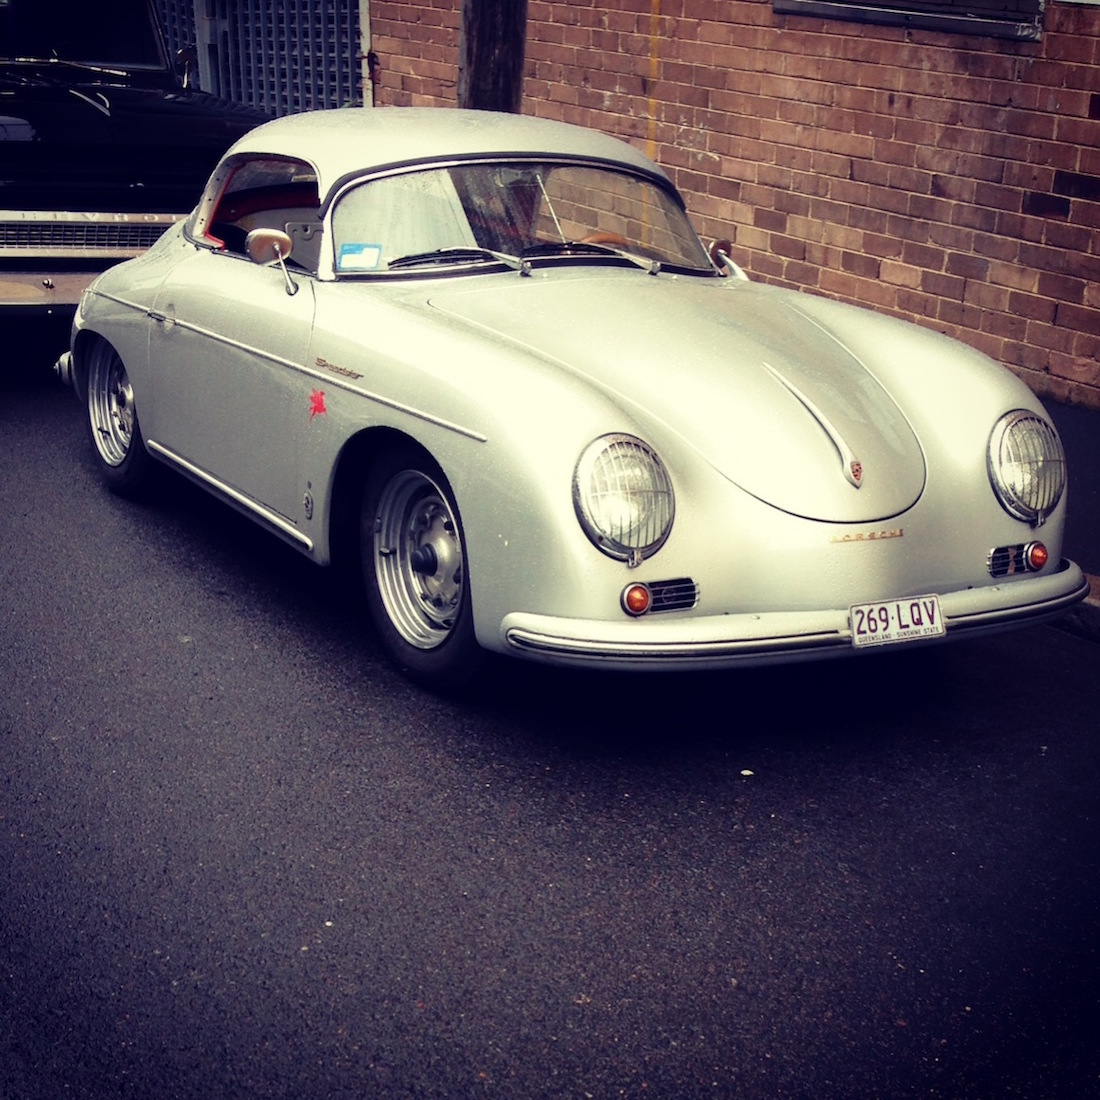 Silver Porsche 356: Porsche 356 Speedster